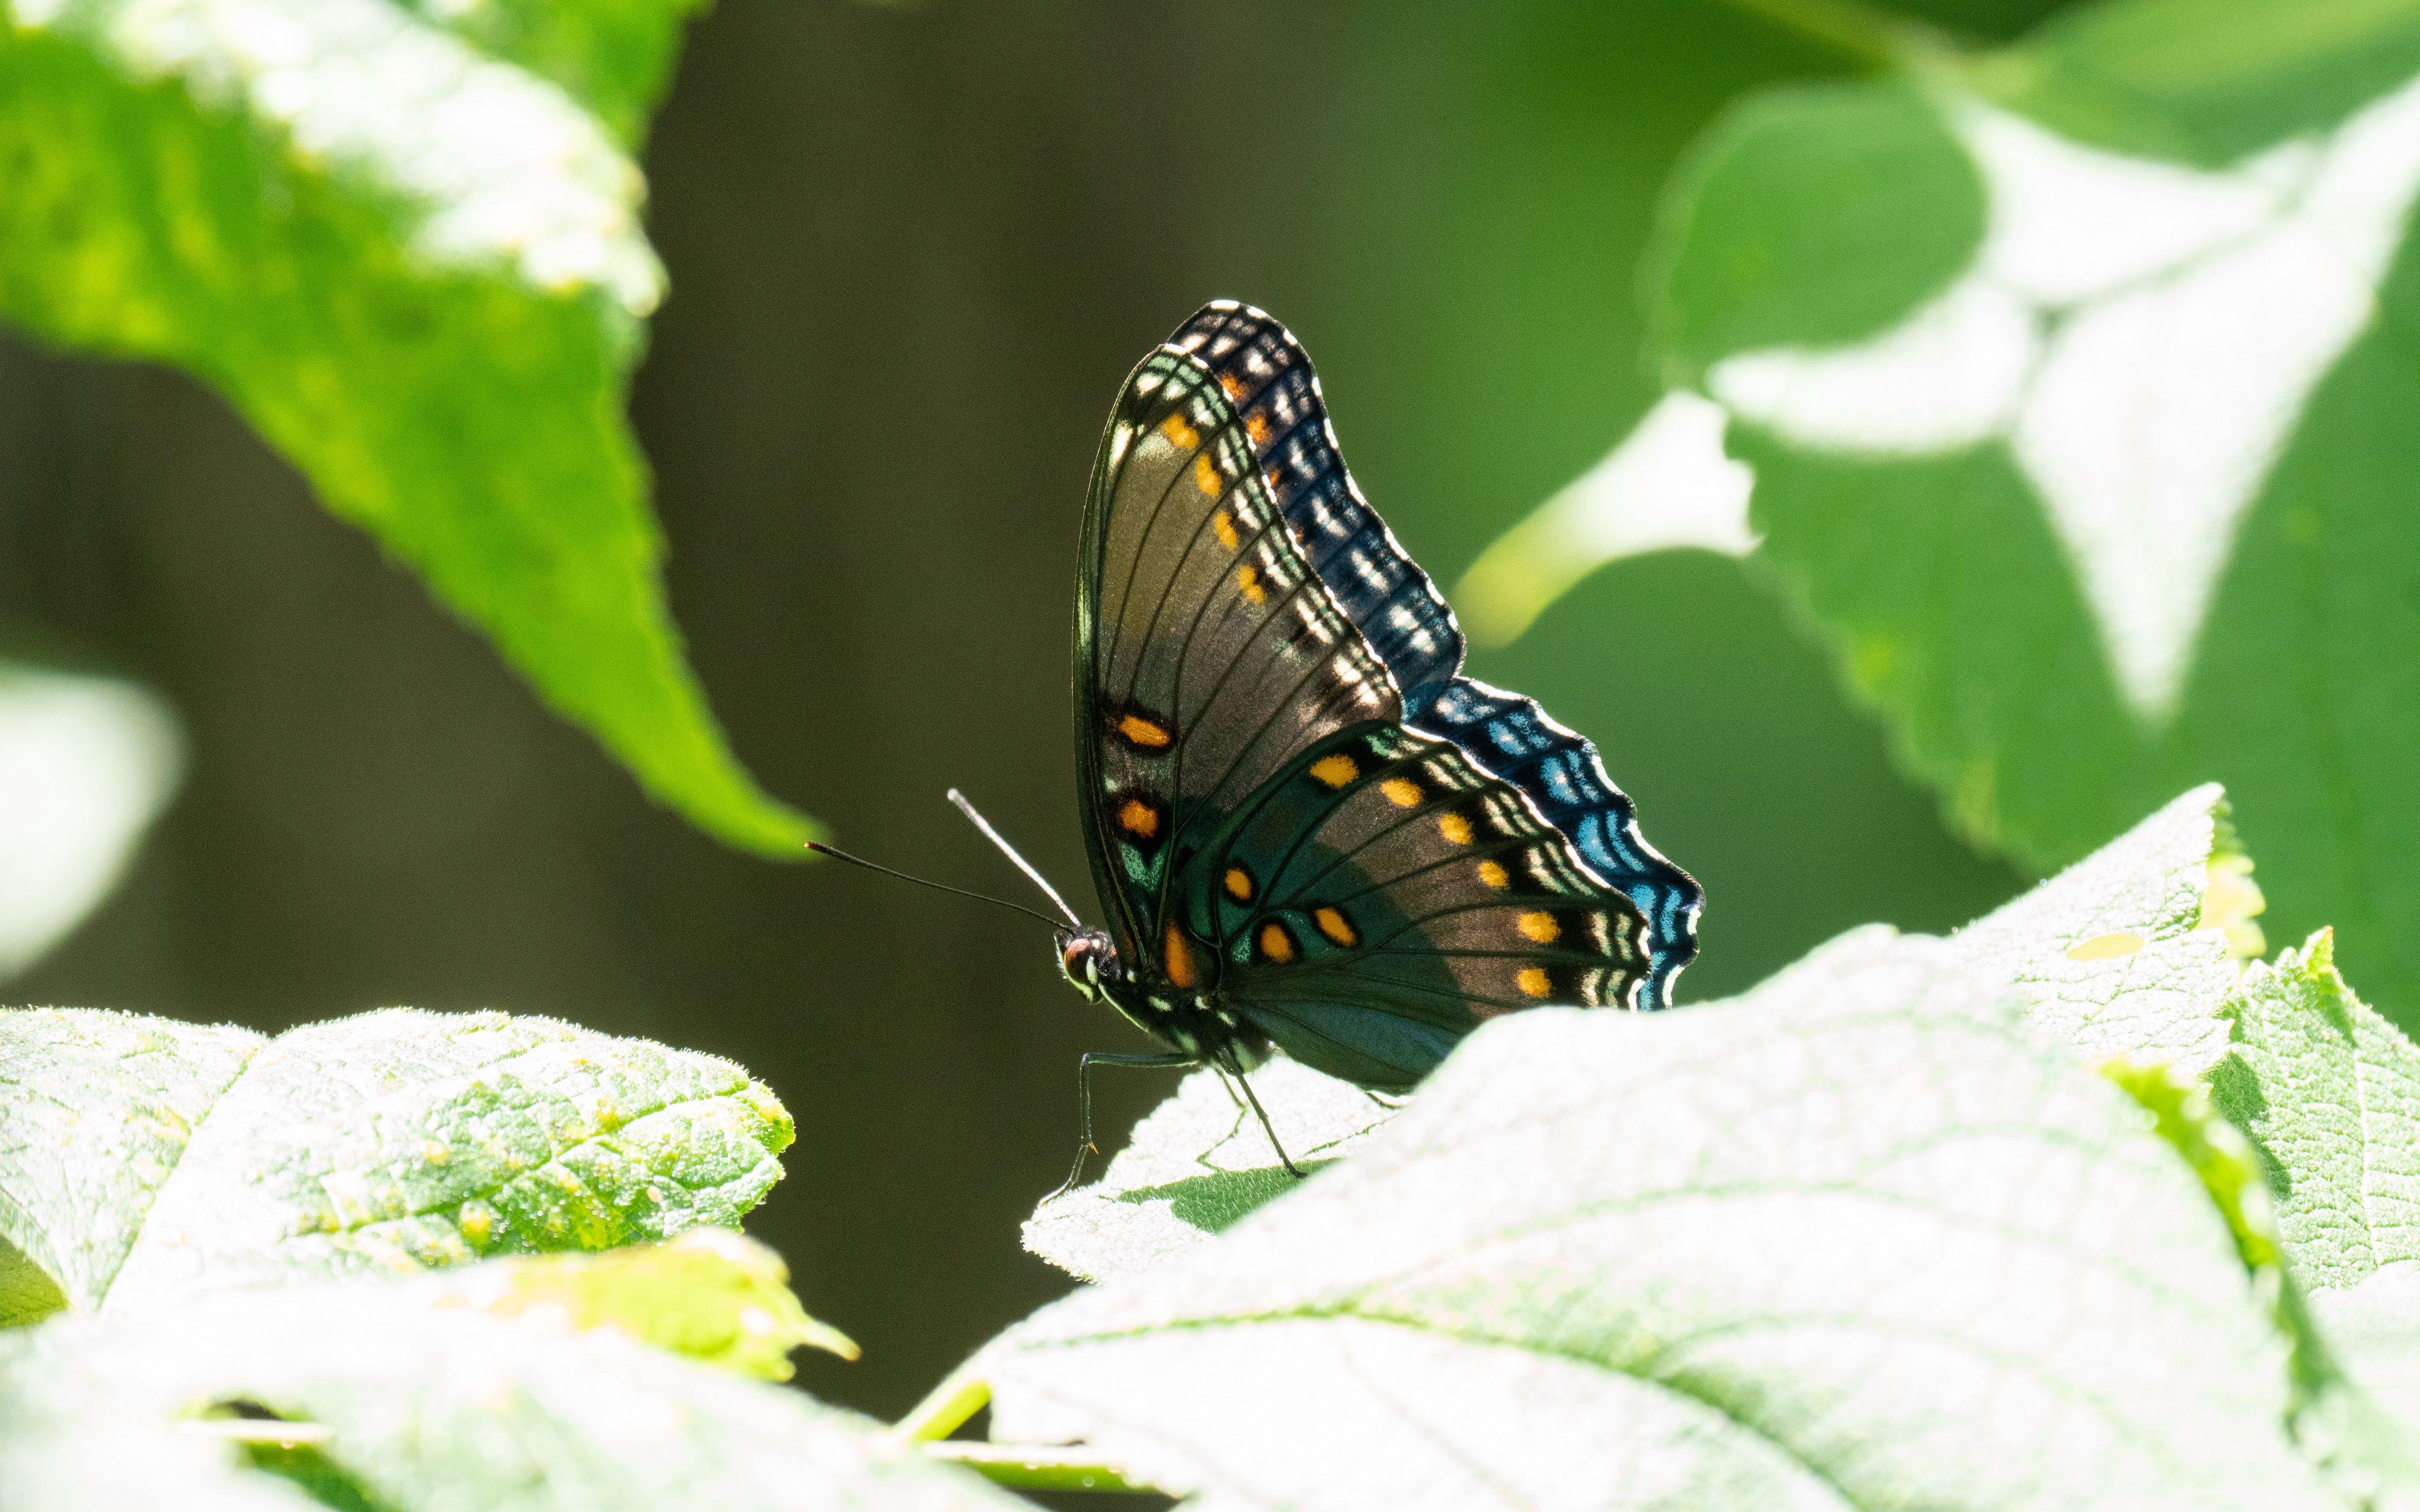 Fondos de pantalla Mariposa con alas tropicales